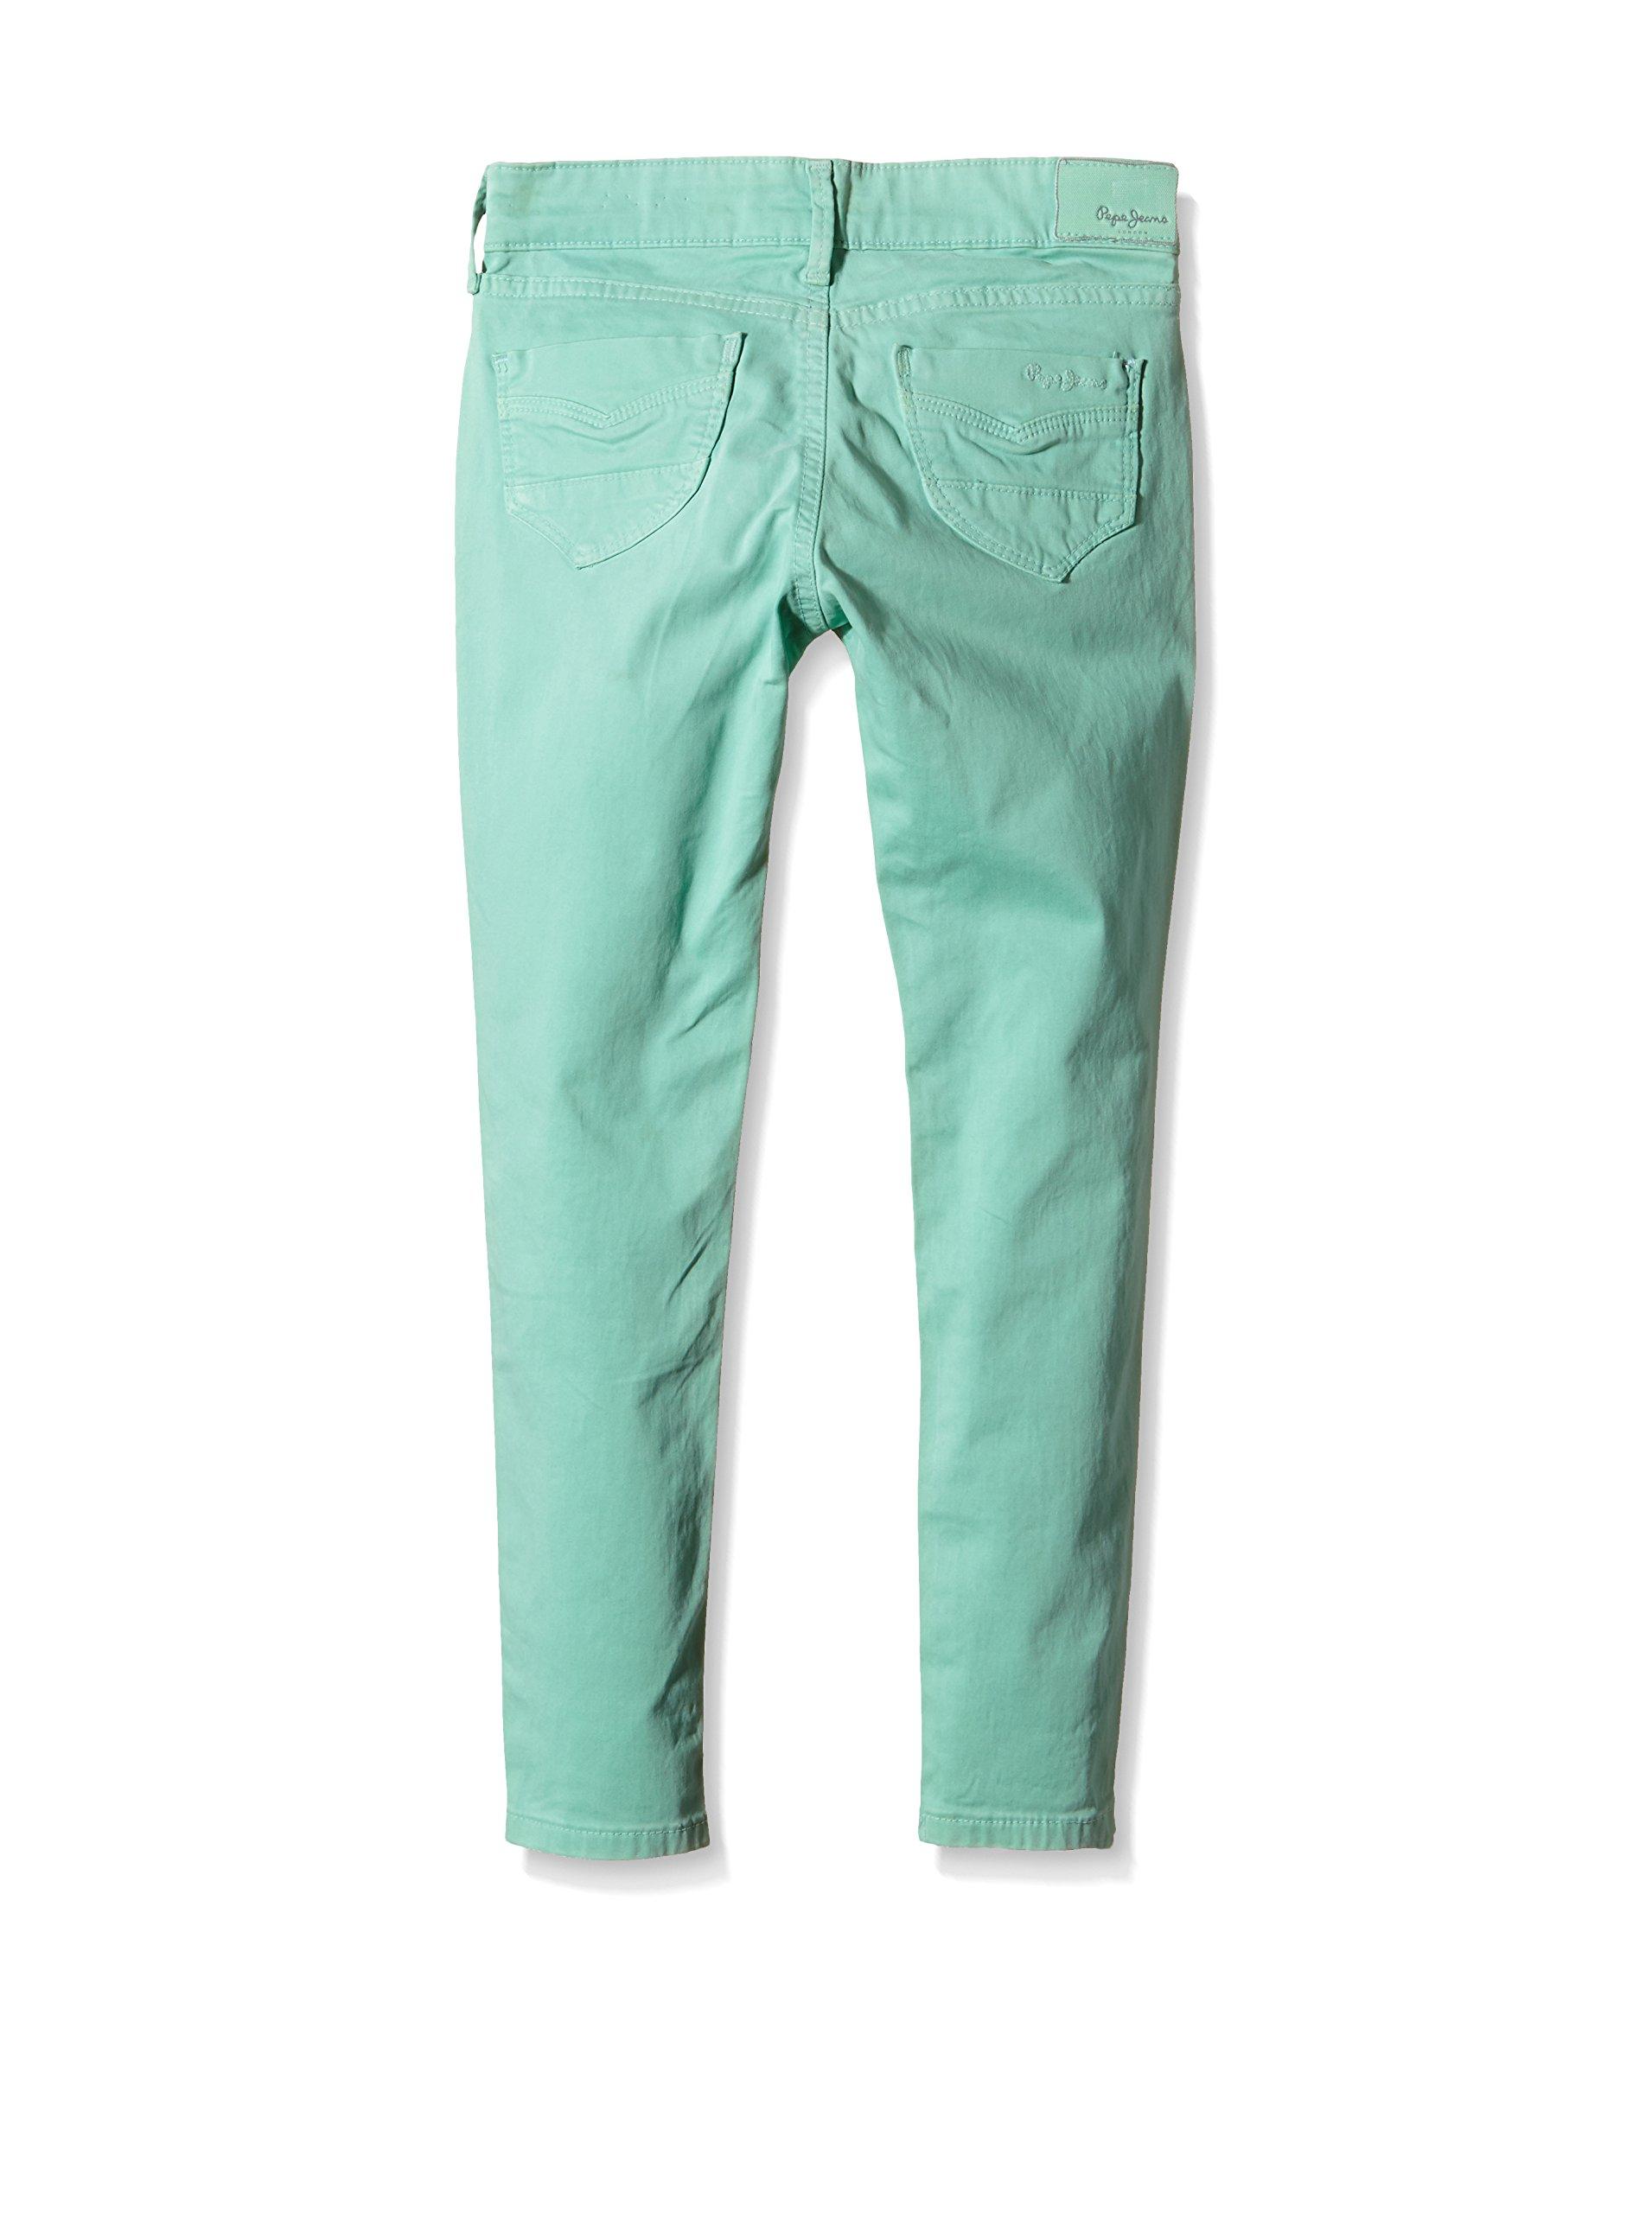 Pepe Jeans London Pantalón Pixlette Verde Claro 4 años (104 cm)